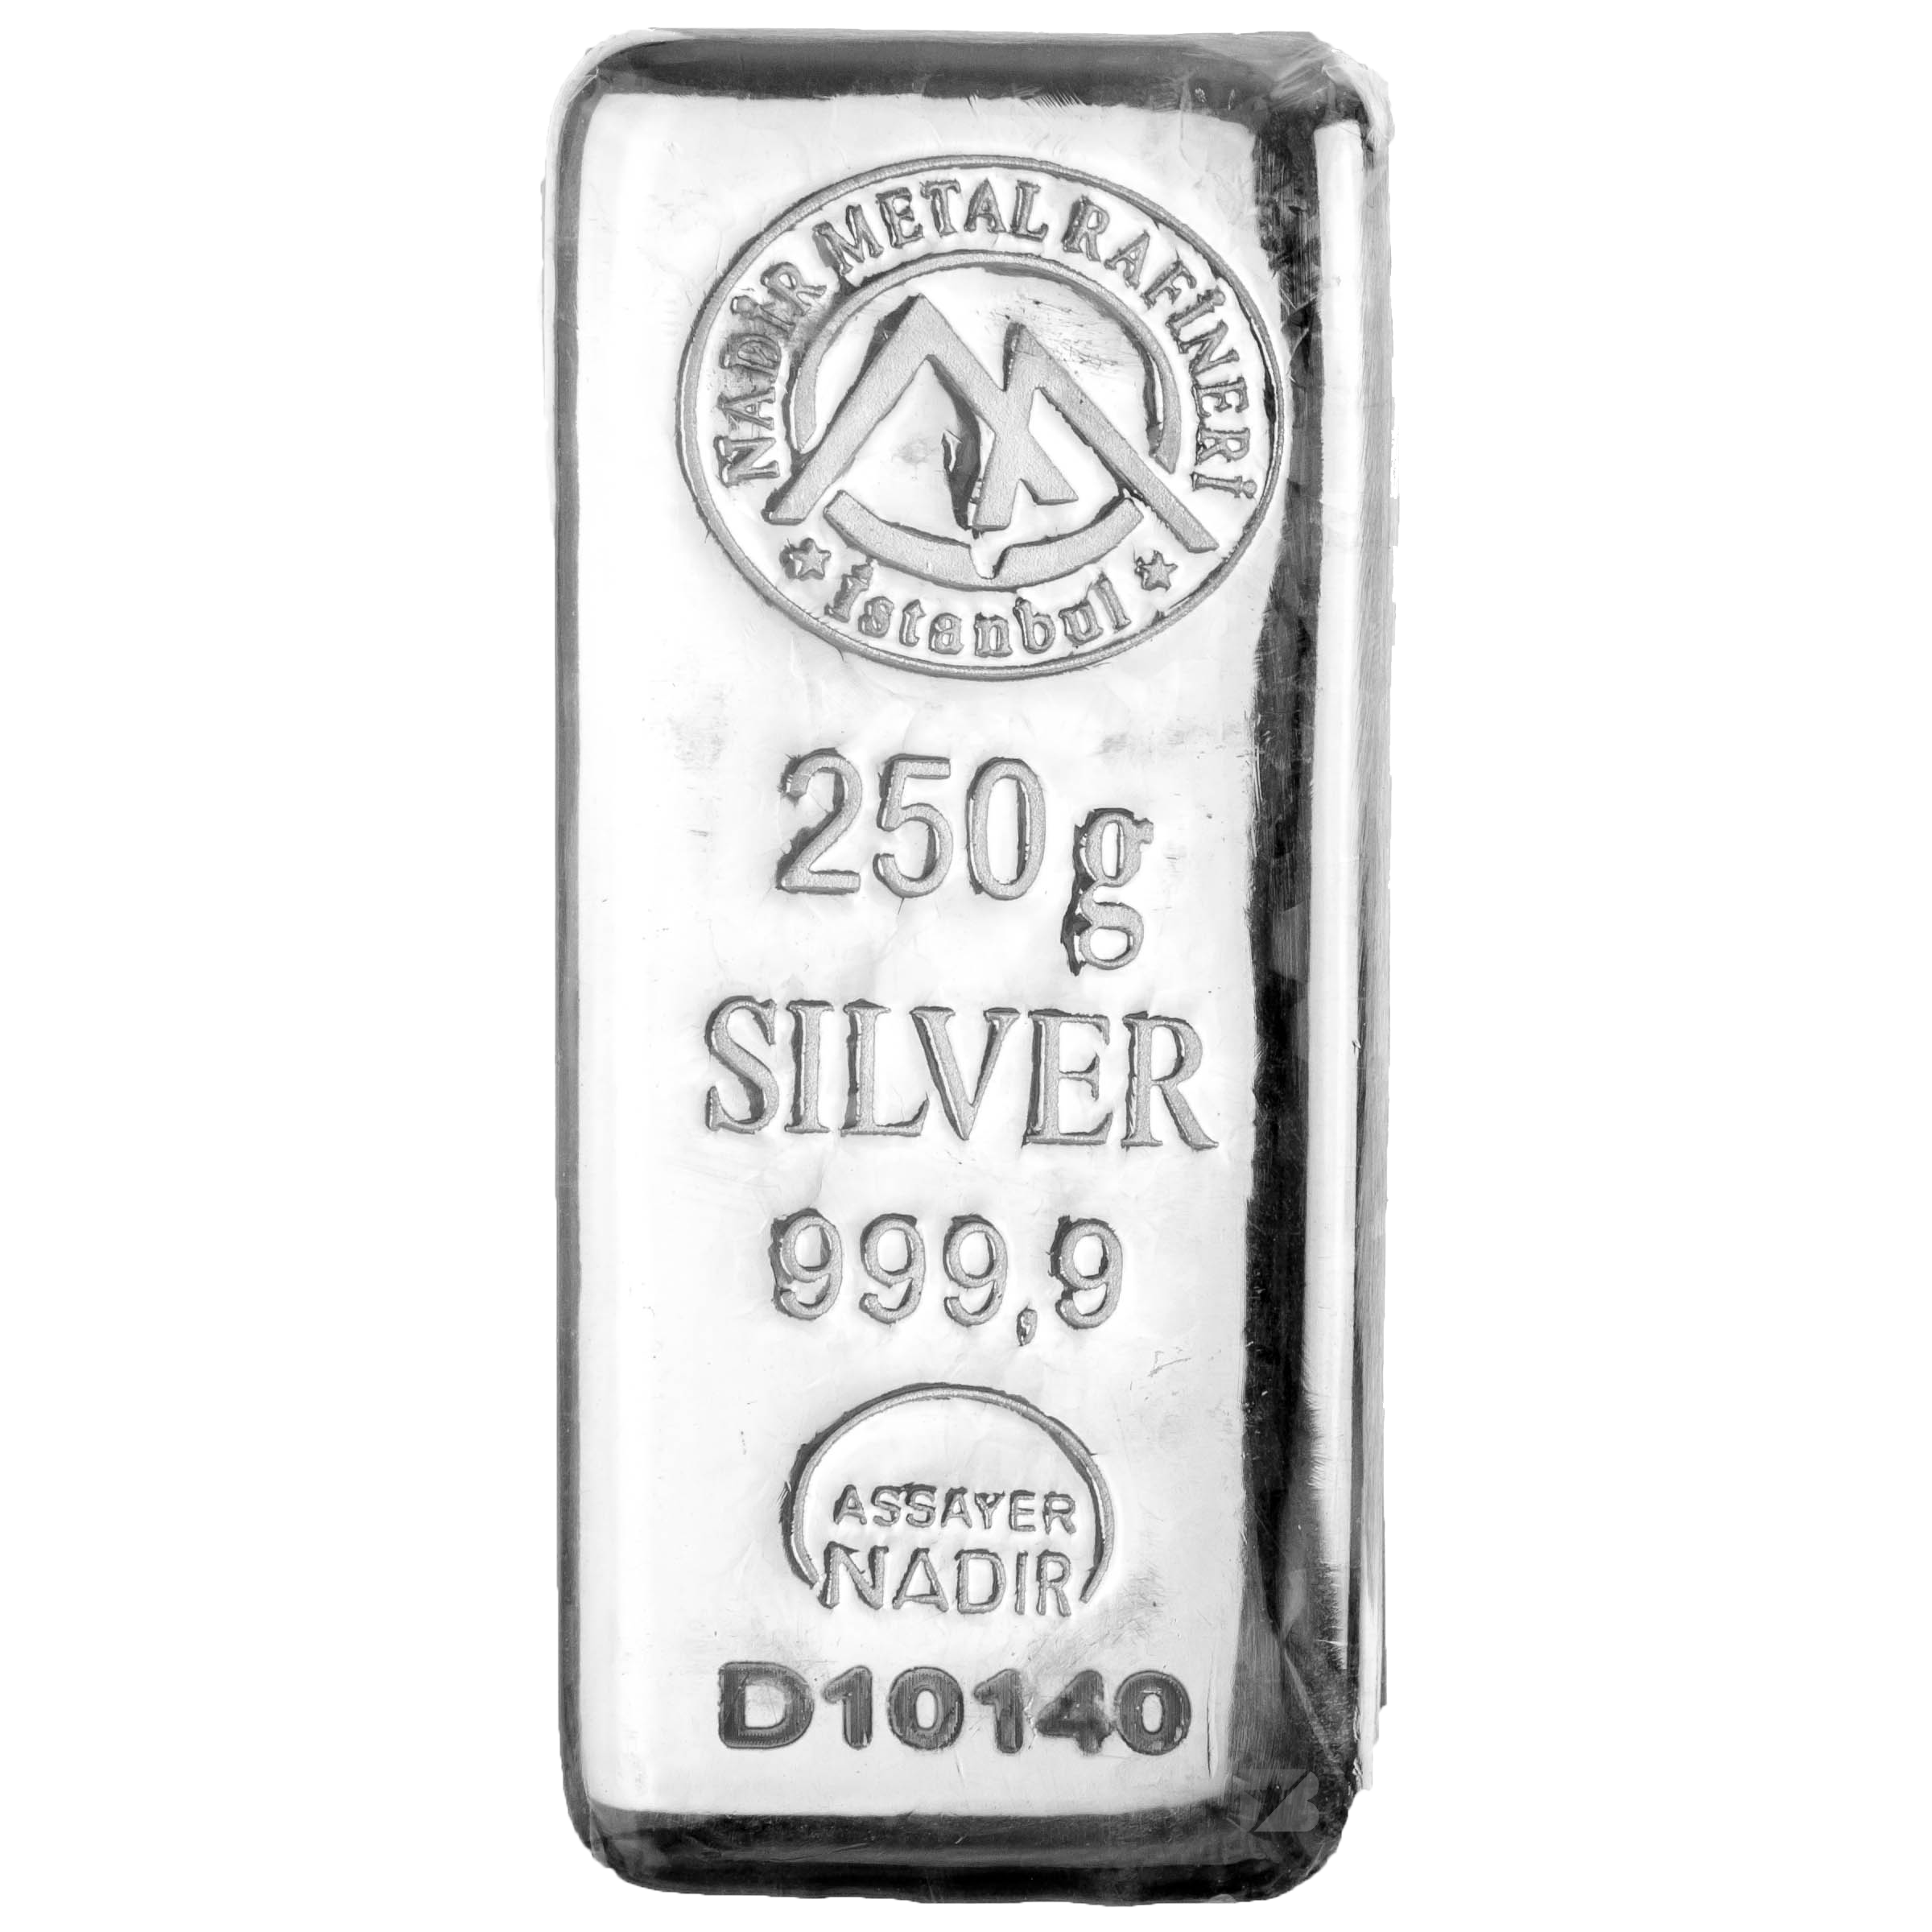 Silver Turkish Platinum: Nadir Refinery Silver Bar